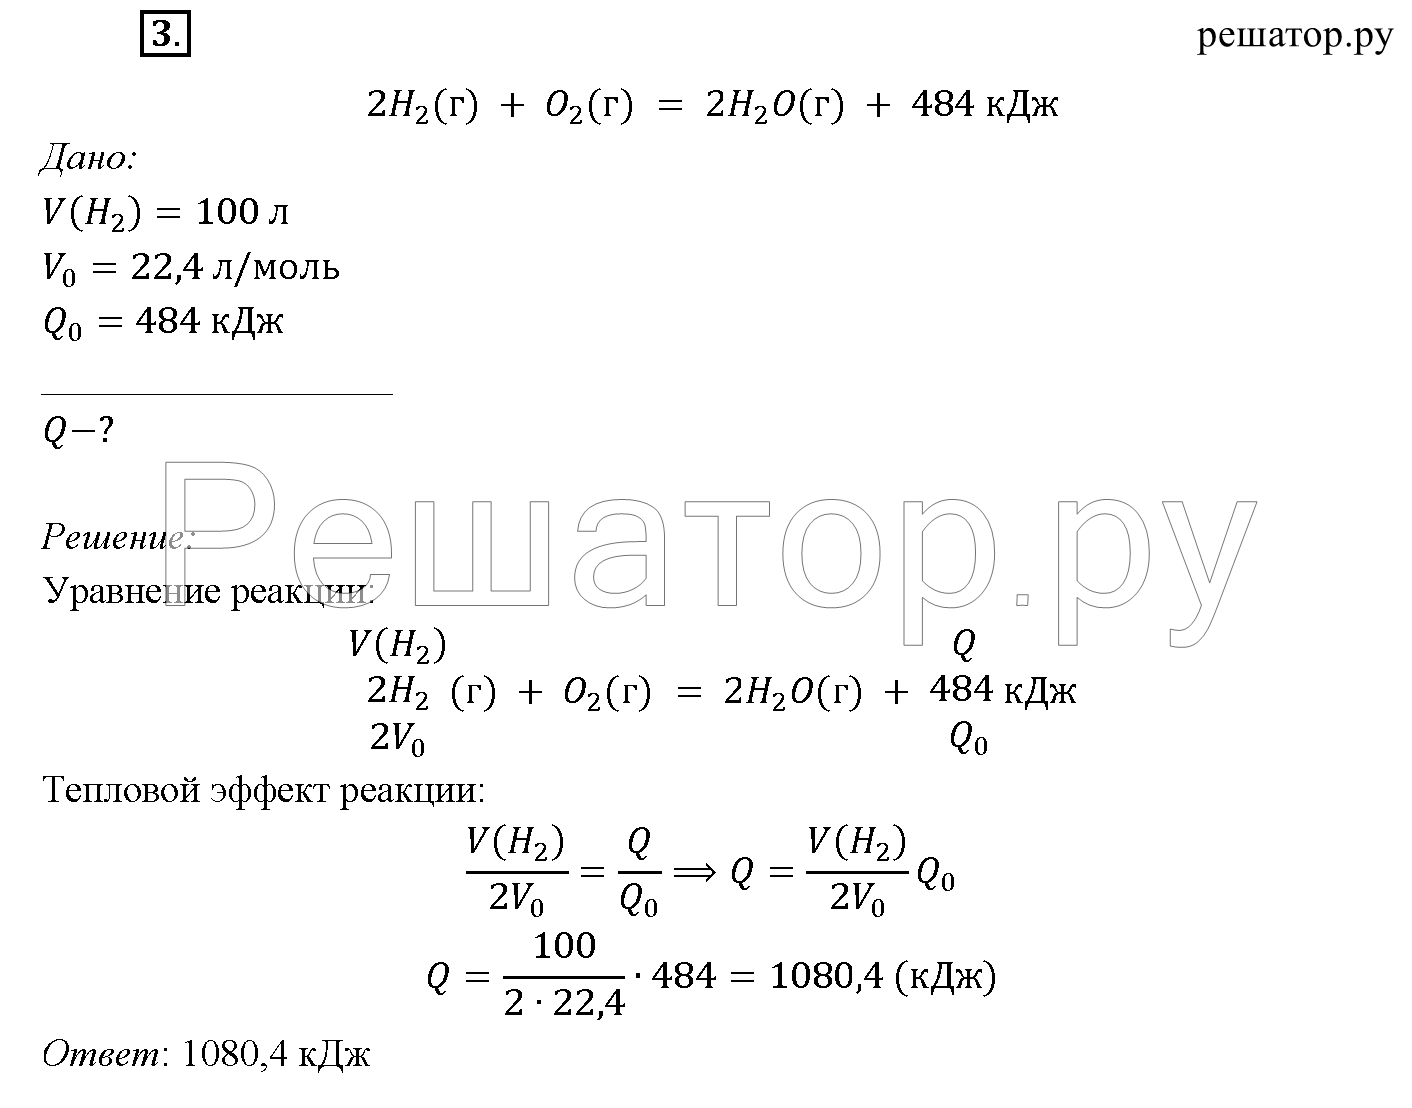 решебник по химии учебник рудзитис